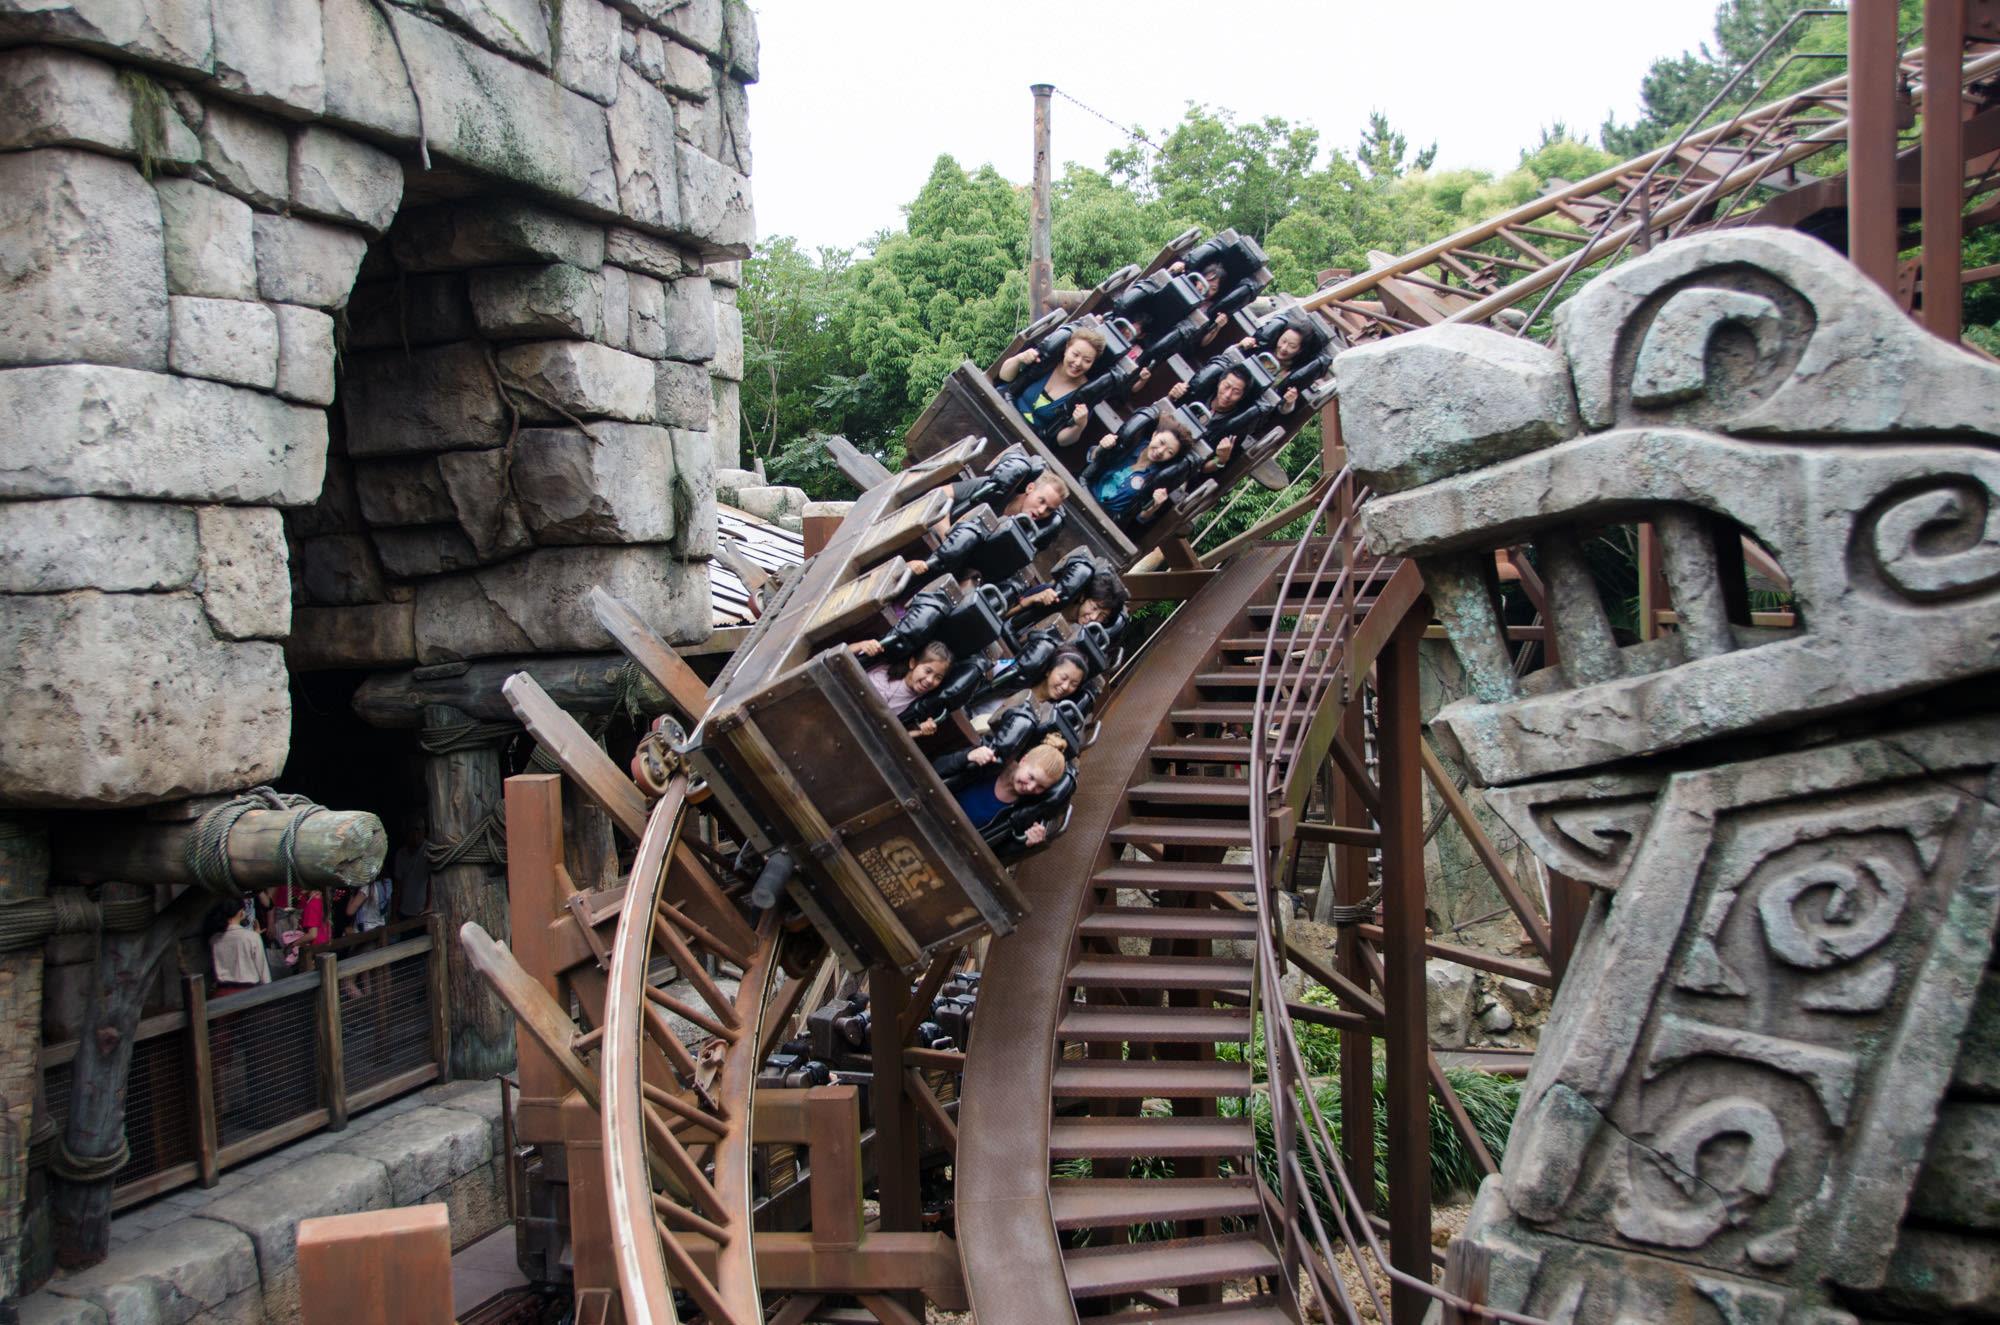 Raging Spirits Roller Coaster